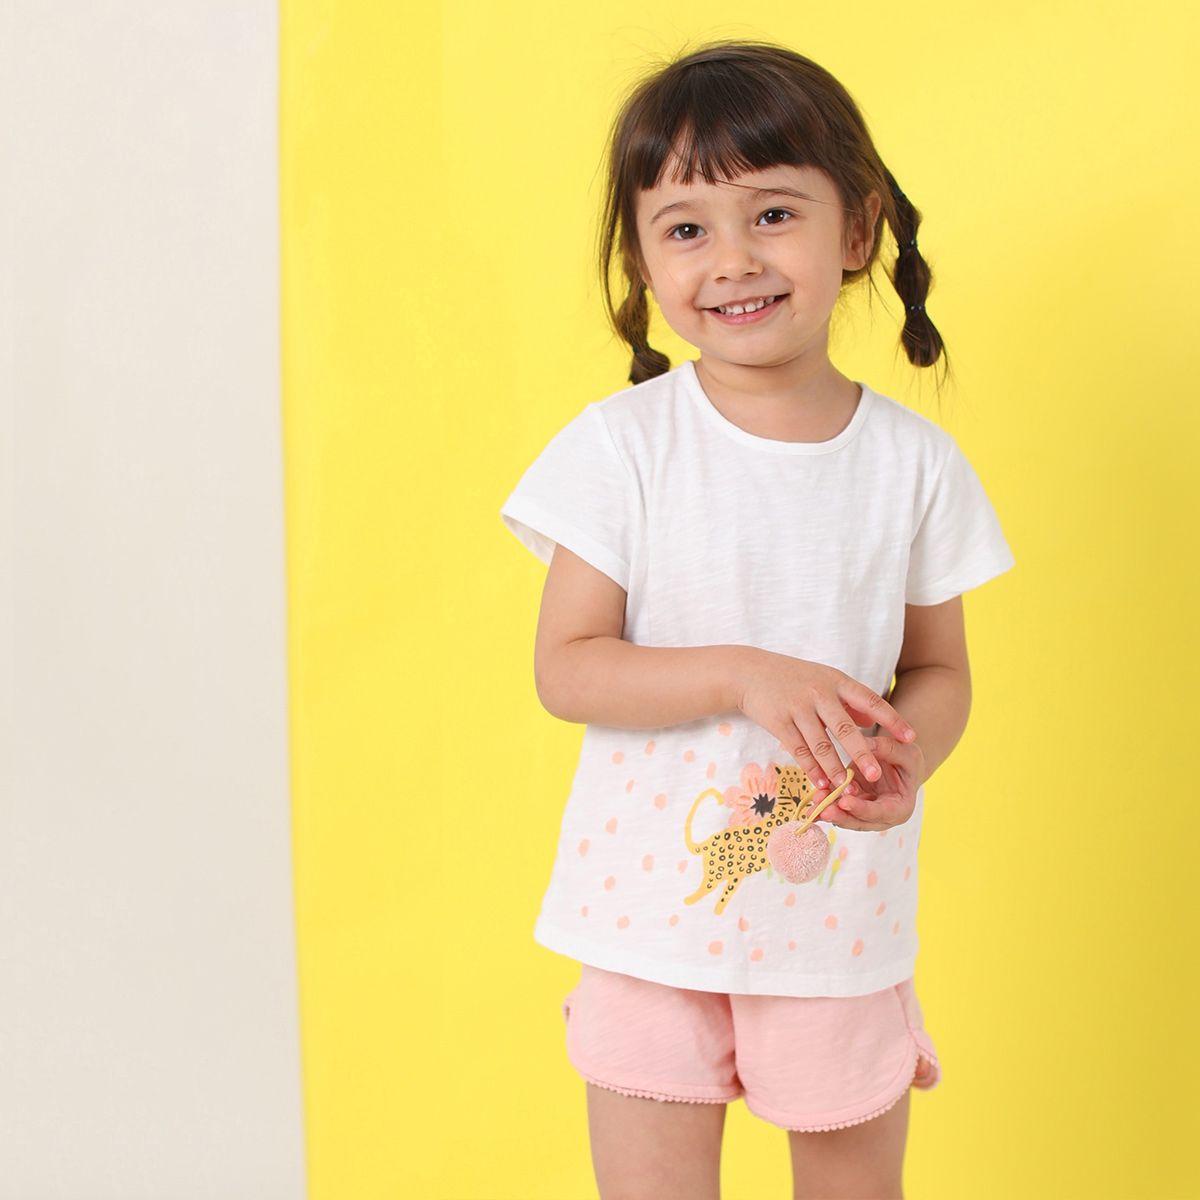 summer new arrivals little girls dress lovemarcjanie kids